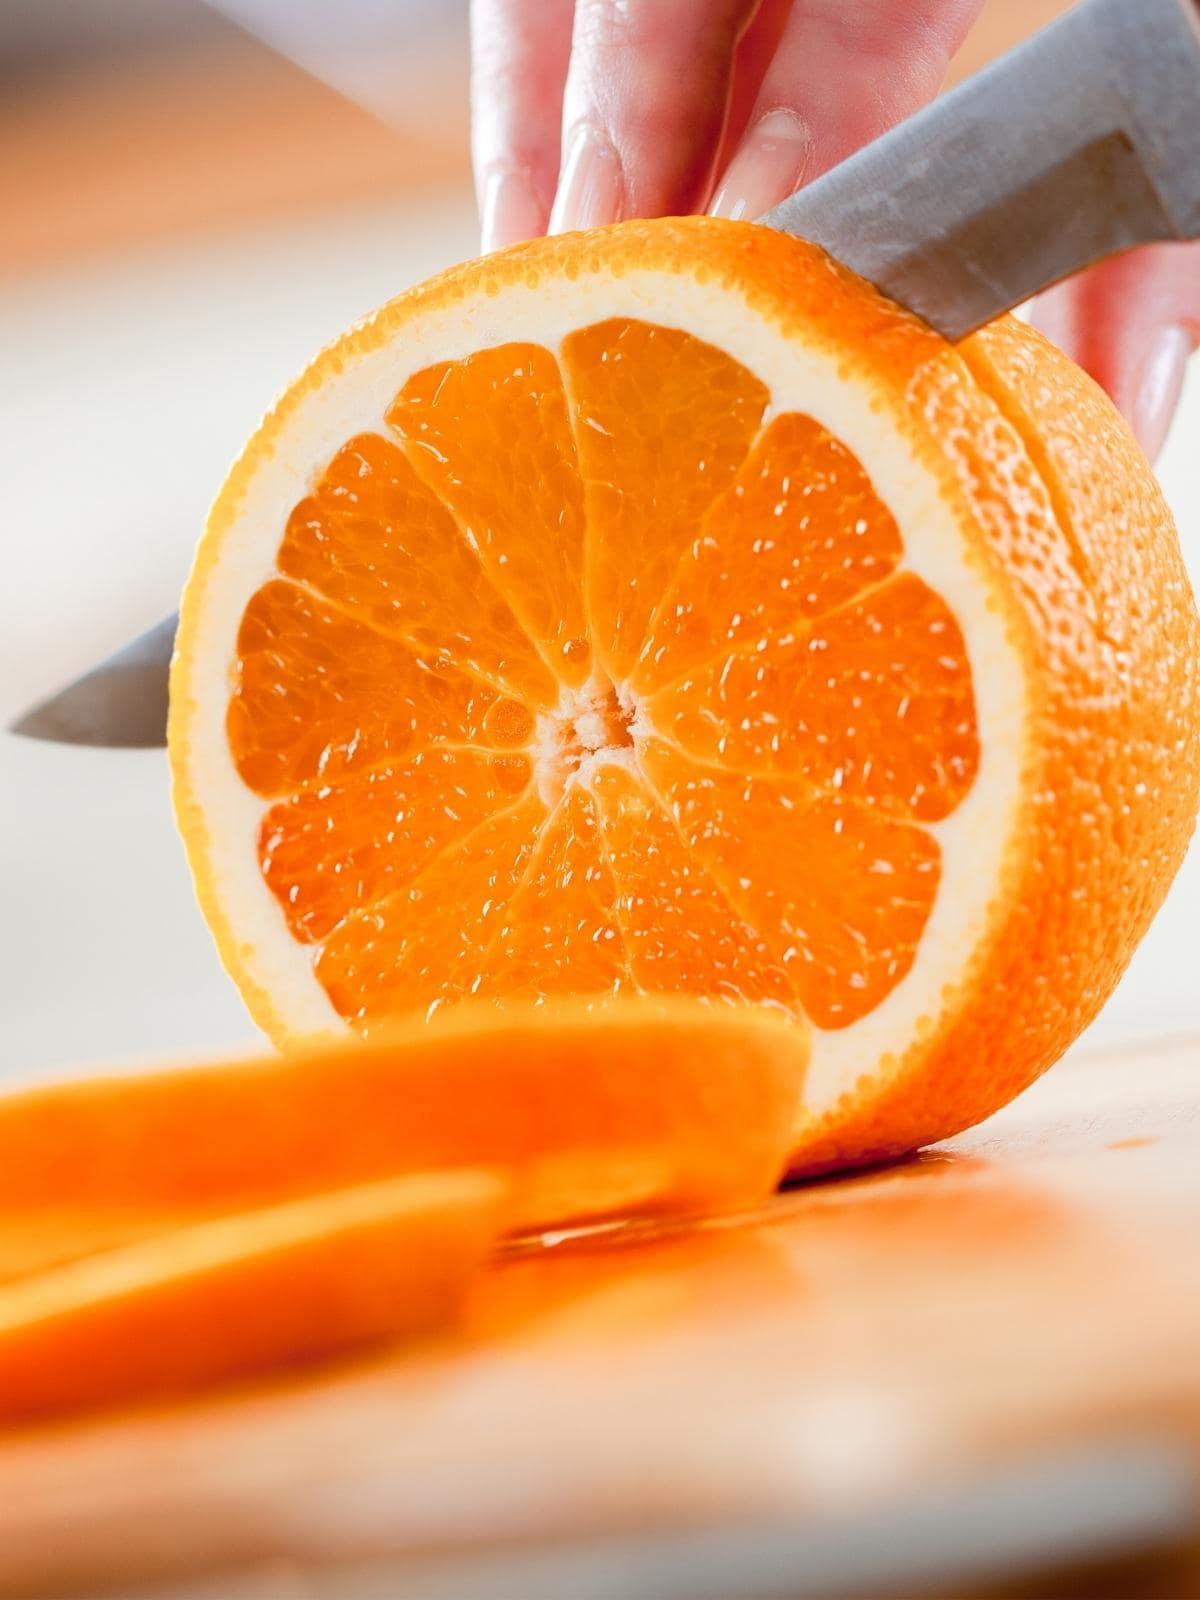 knife cutting circles of oranges.